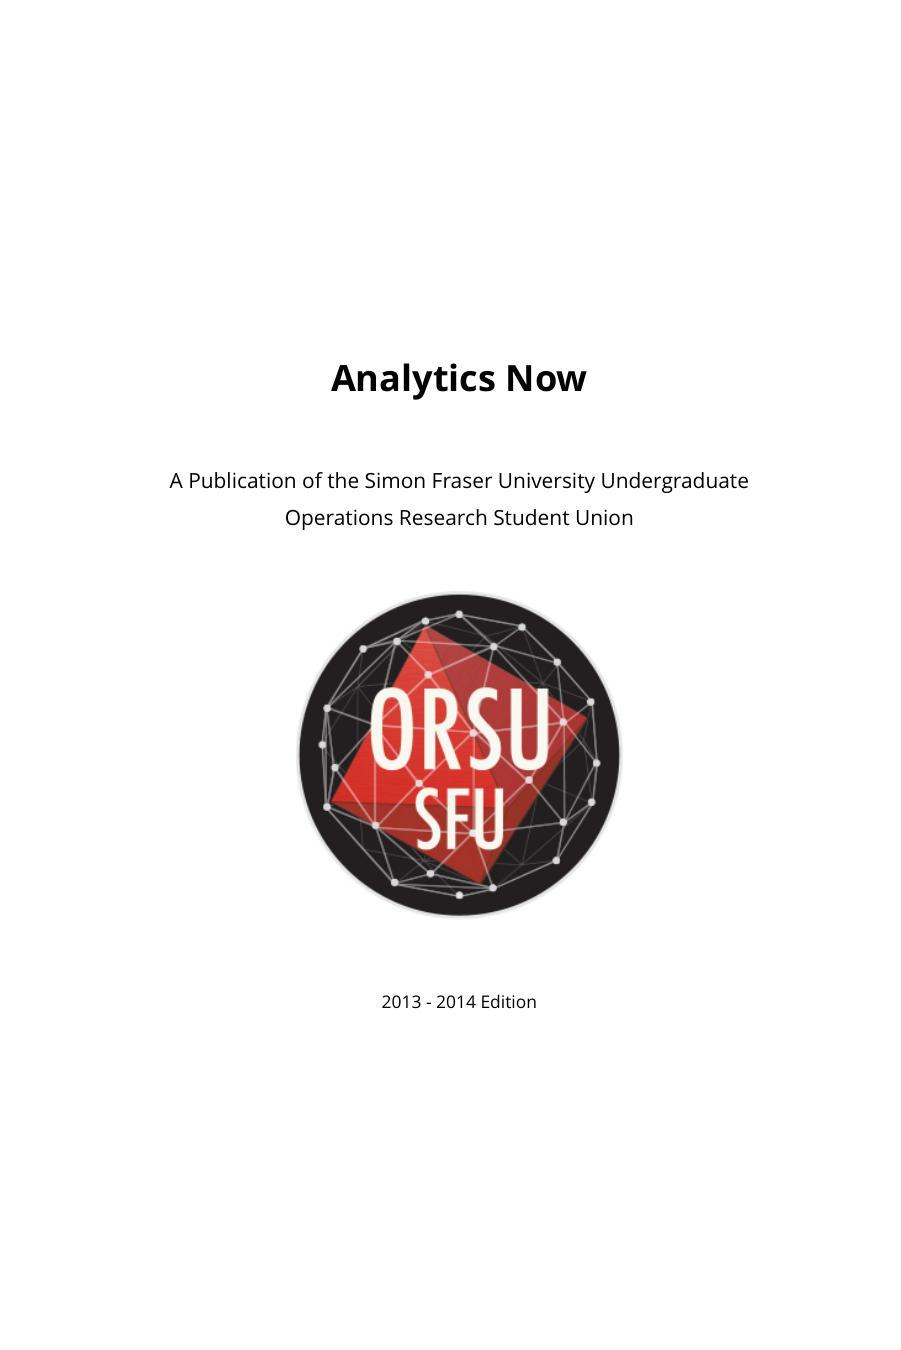 View Analytics Now 2013-2014 Edition